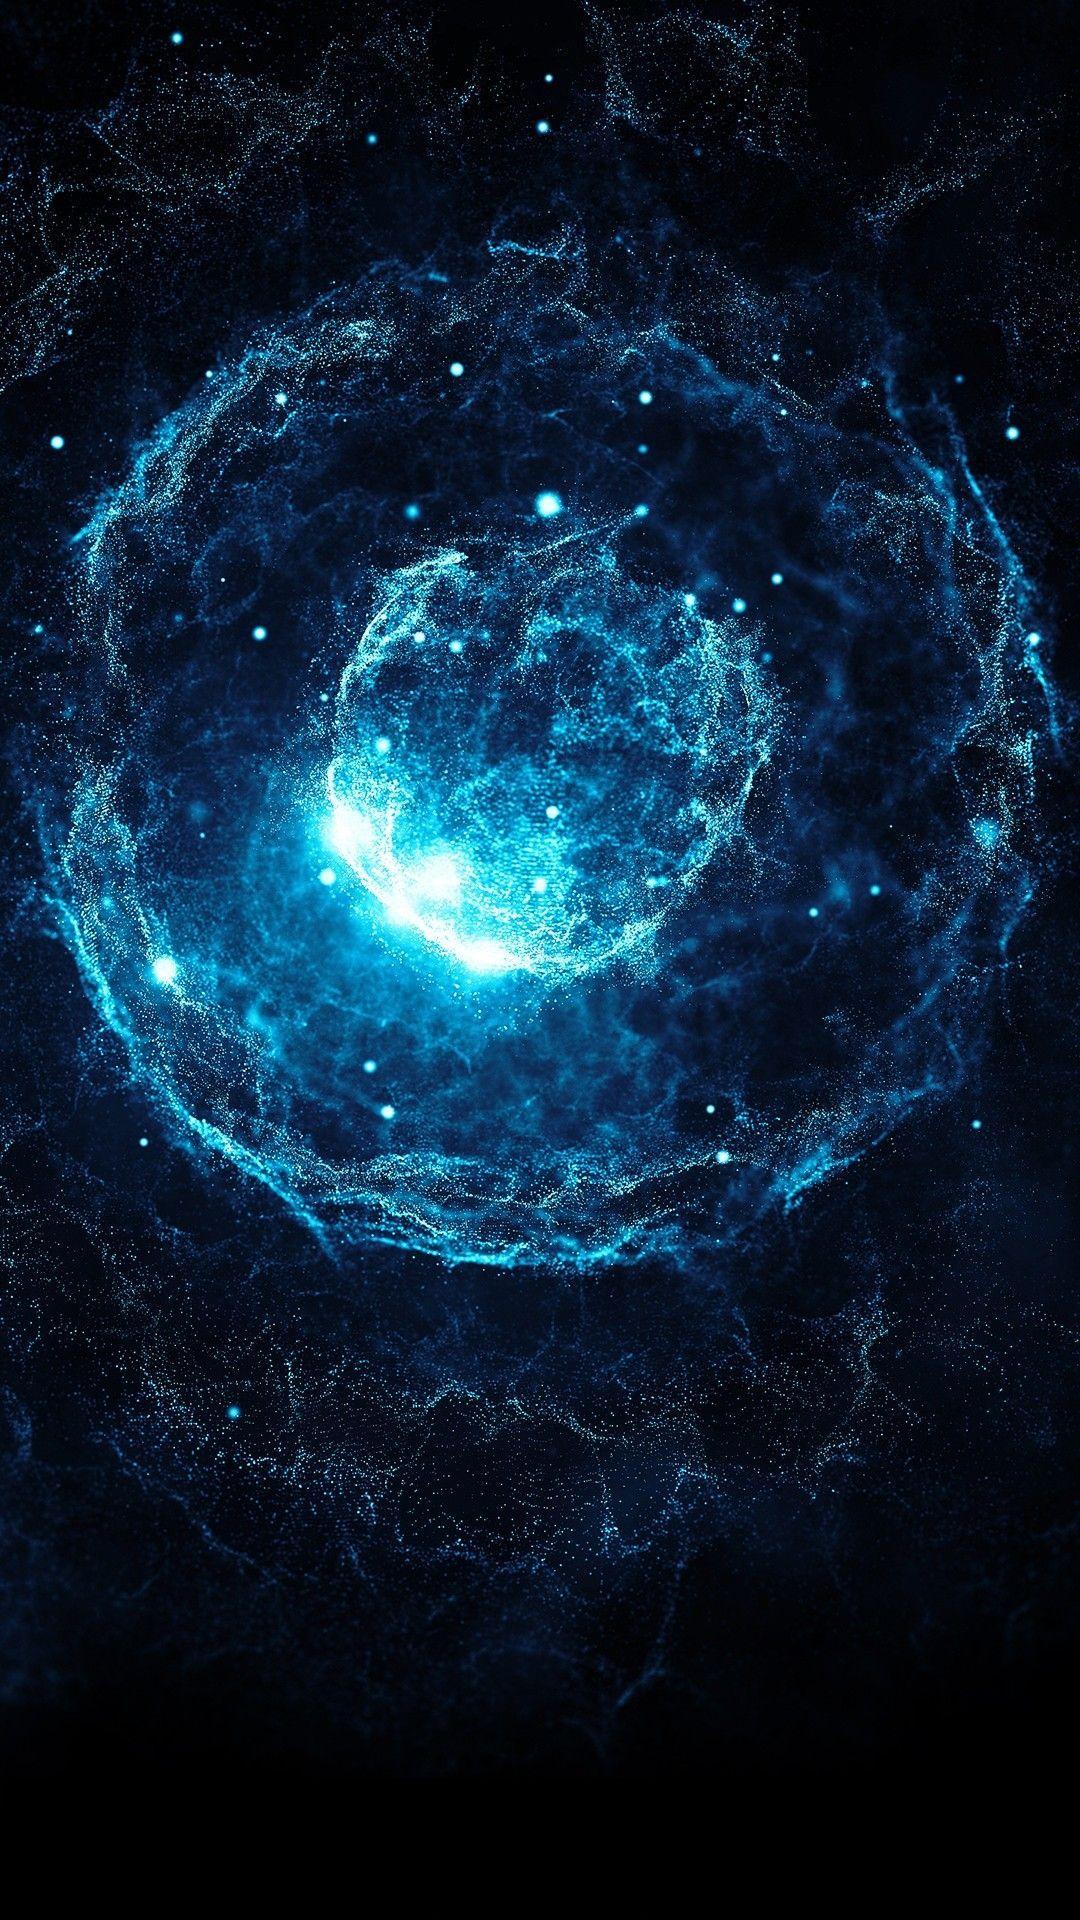 Galaxy Dark Blue Photo Arte Cosmica Plano De Fundo Iphone Planos De Fundo Ideas for galaxy dark blue wallpaper hd